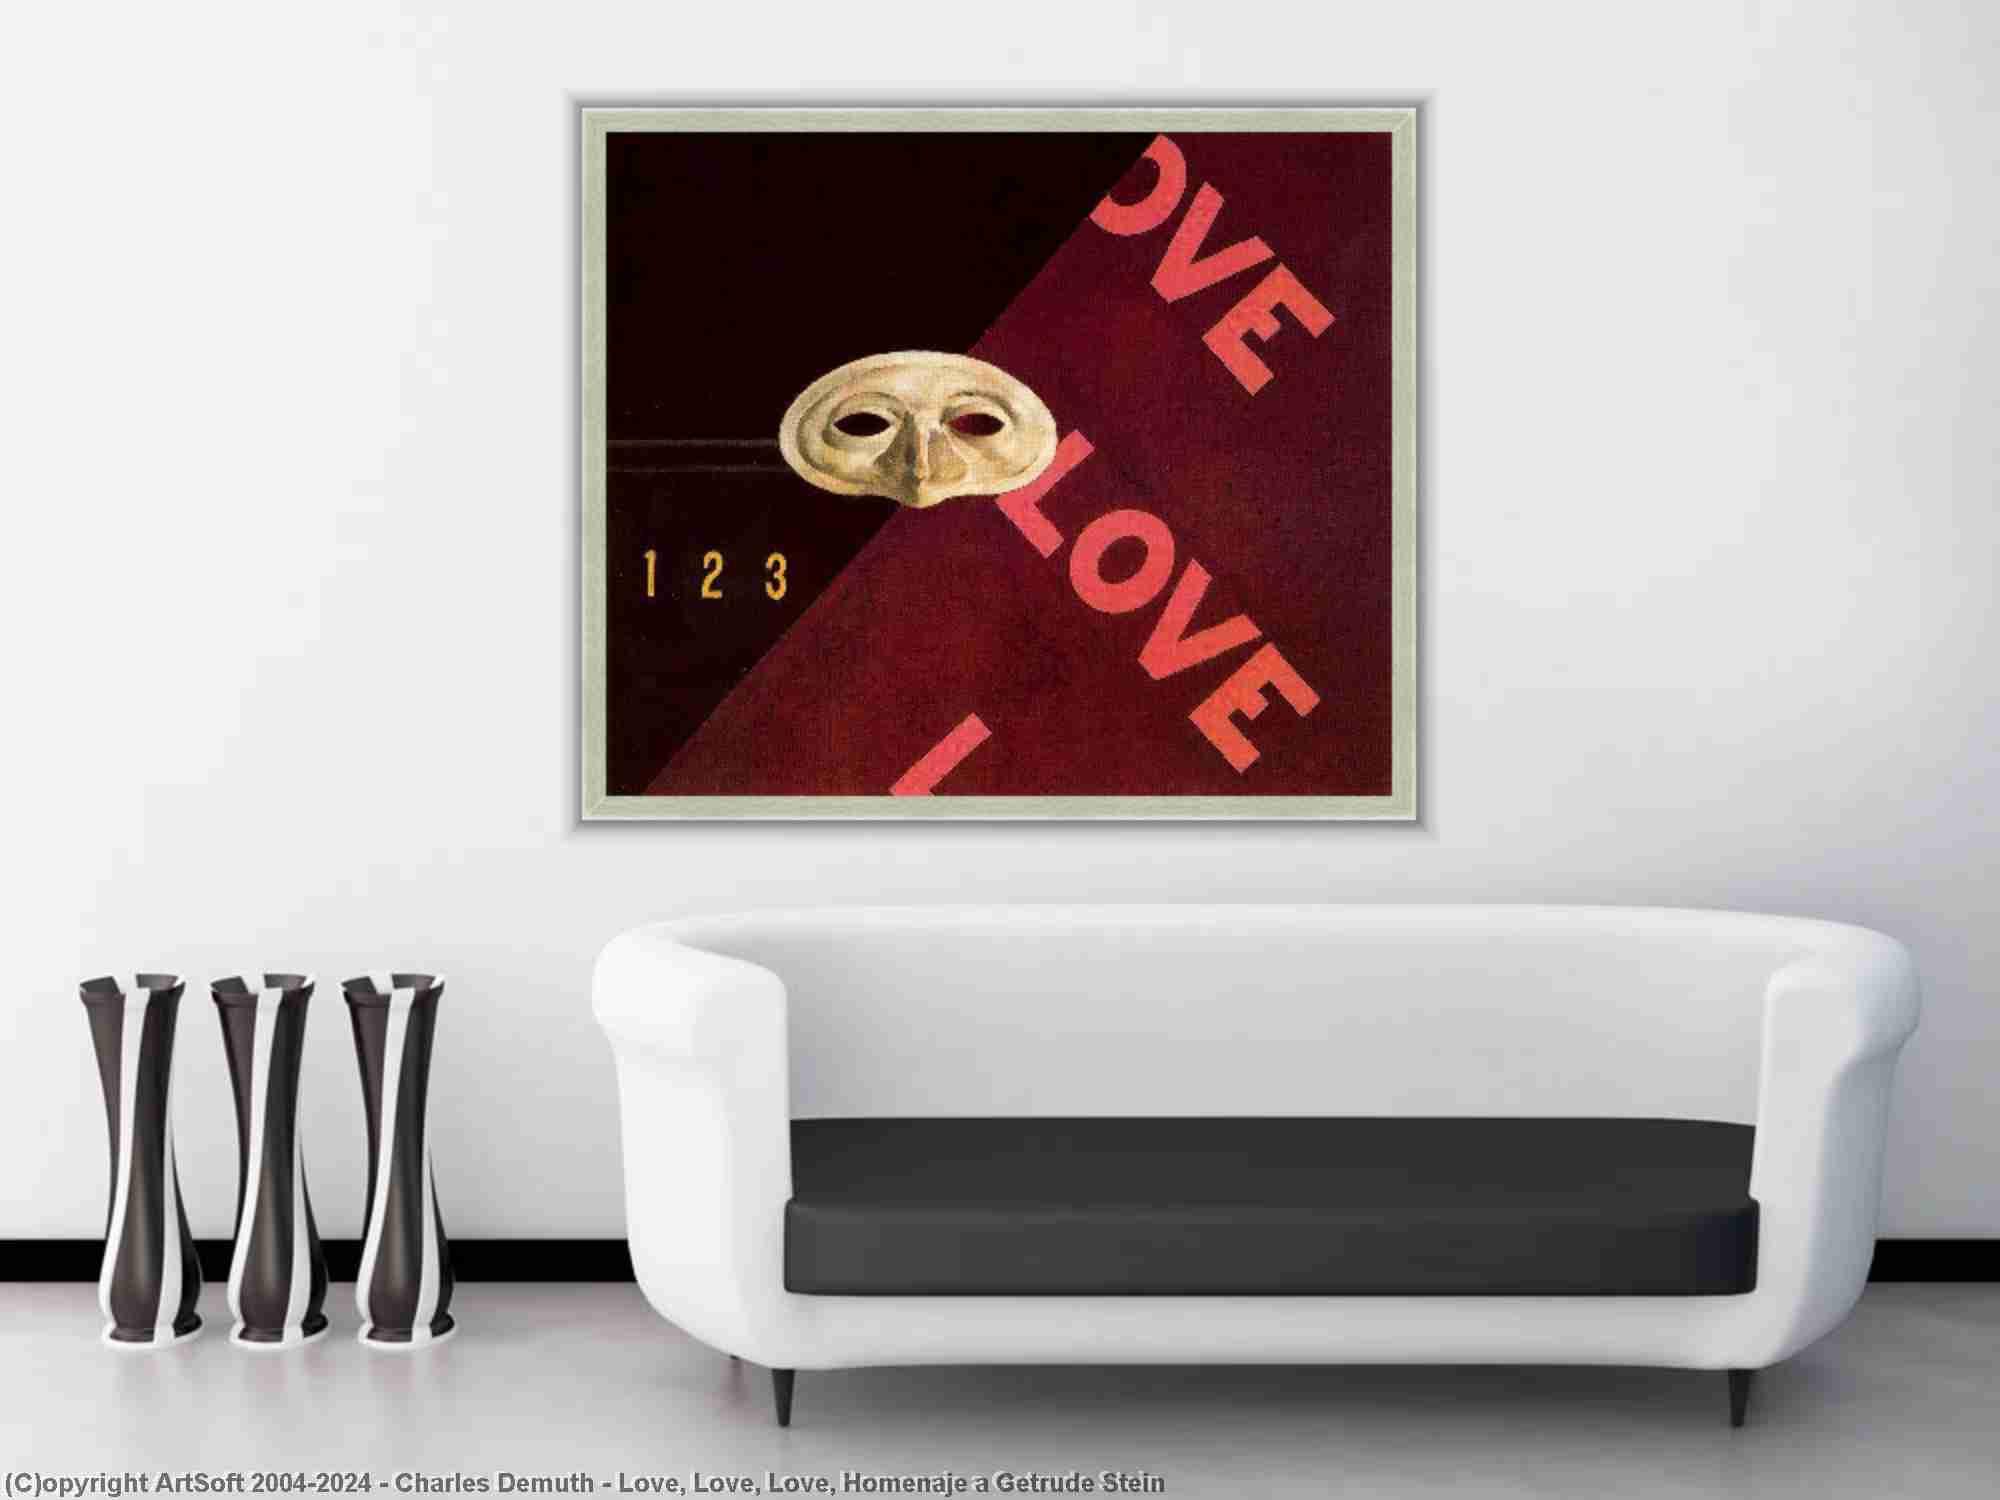 Charles Demuth - Love, Love, Love, Homenaje a Getrude Stein